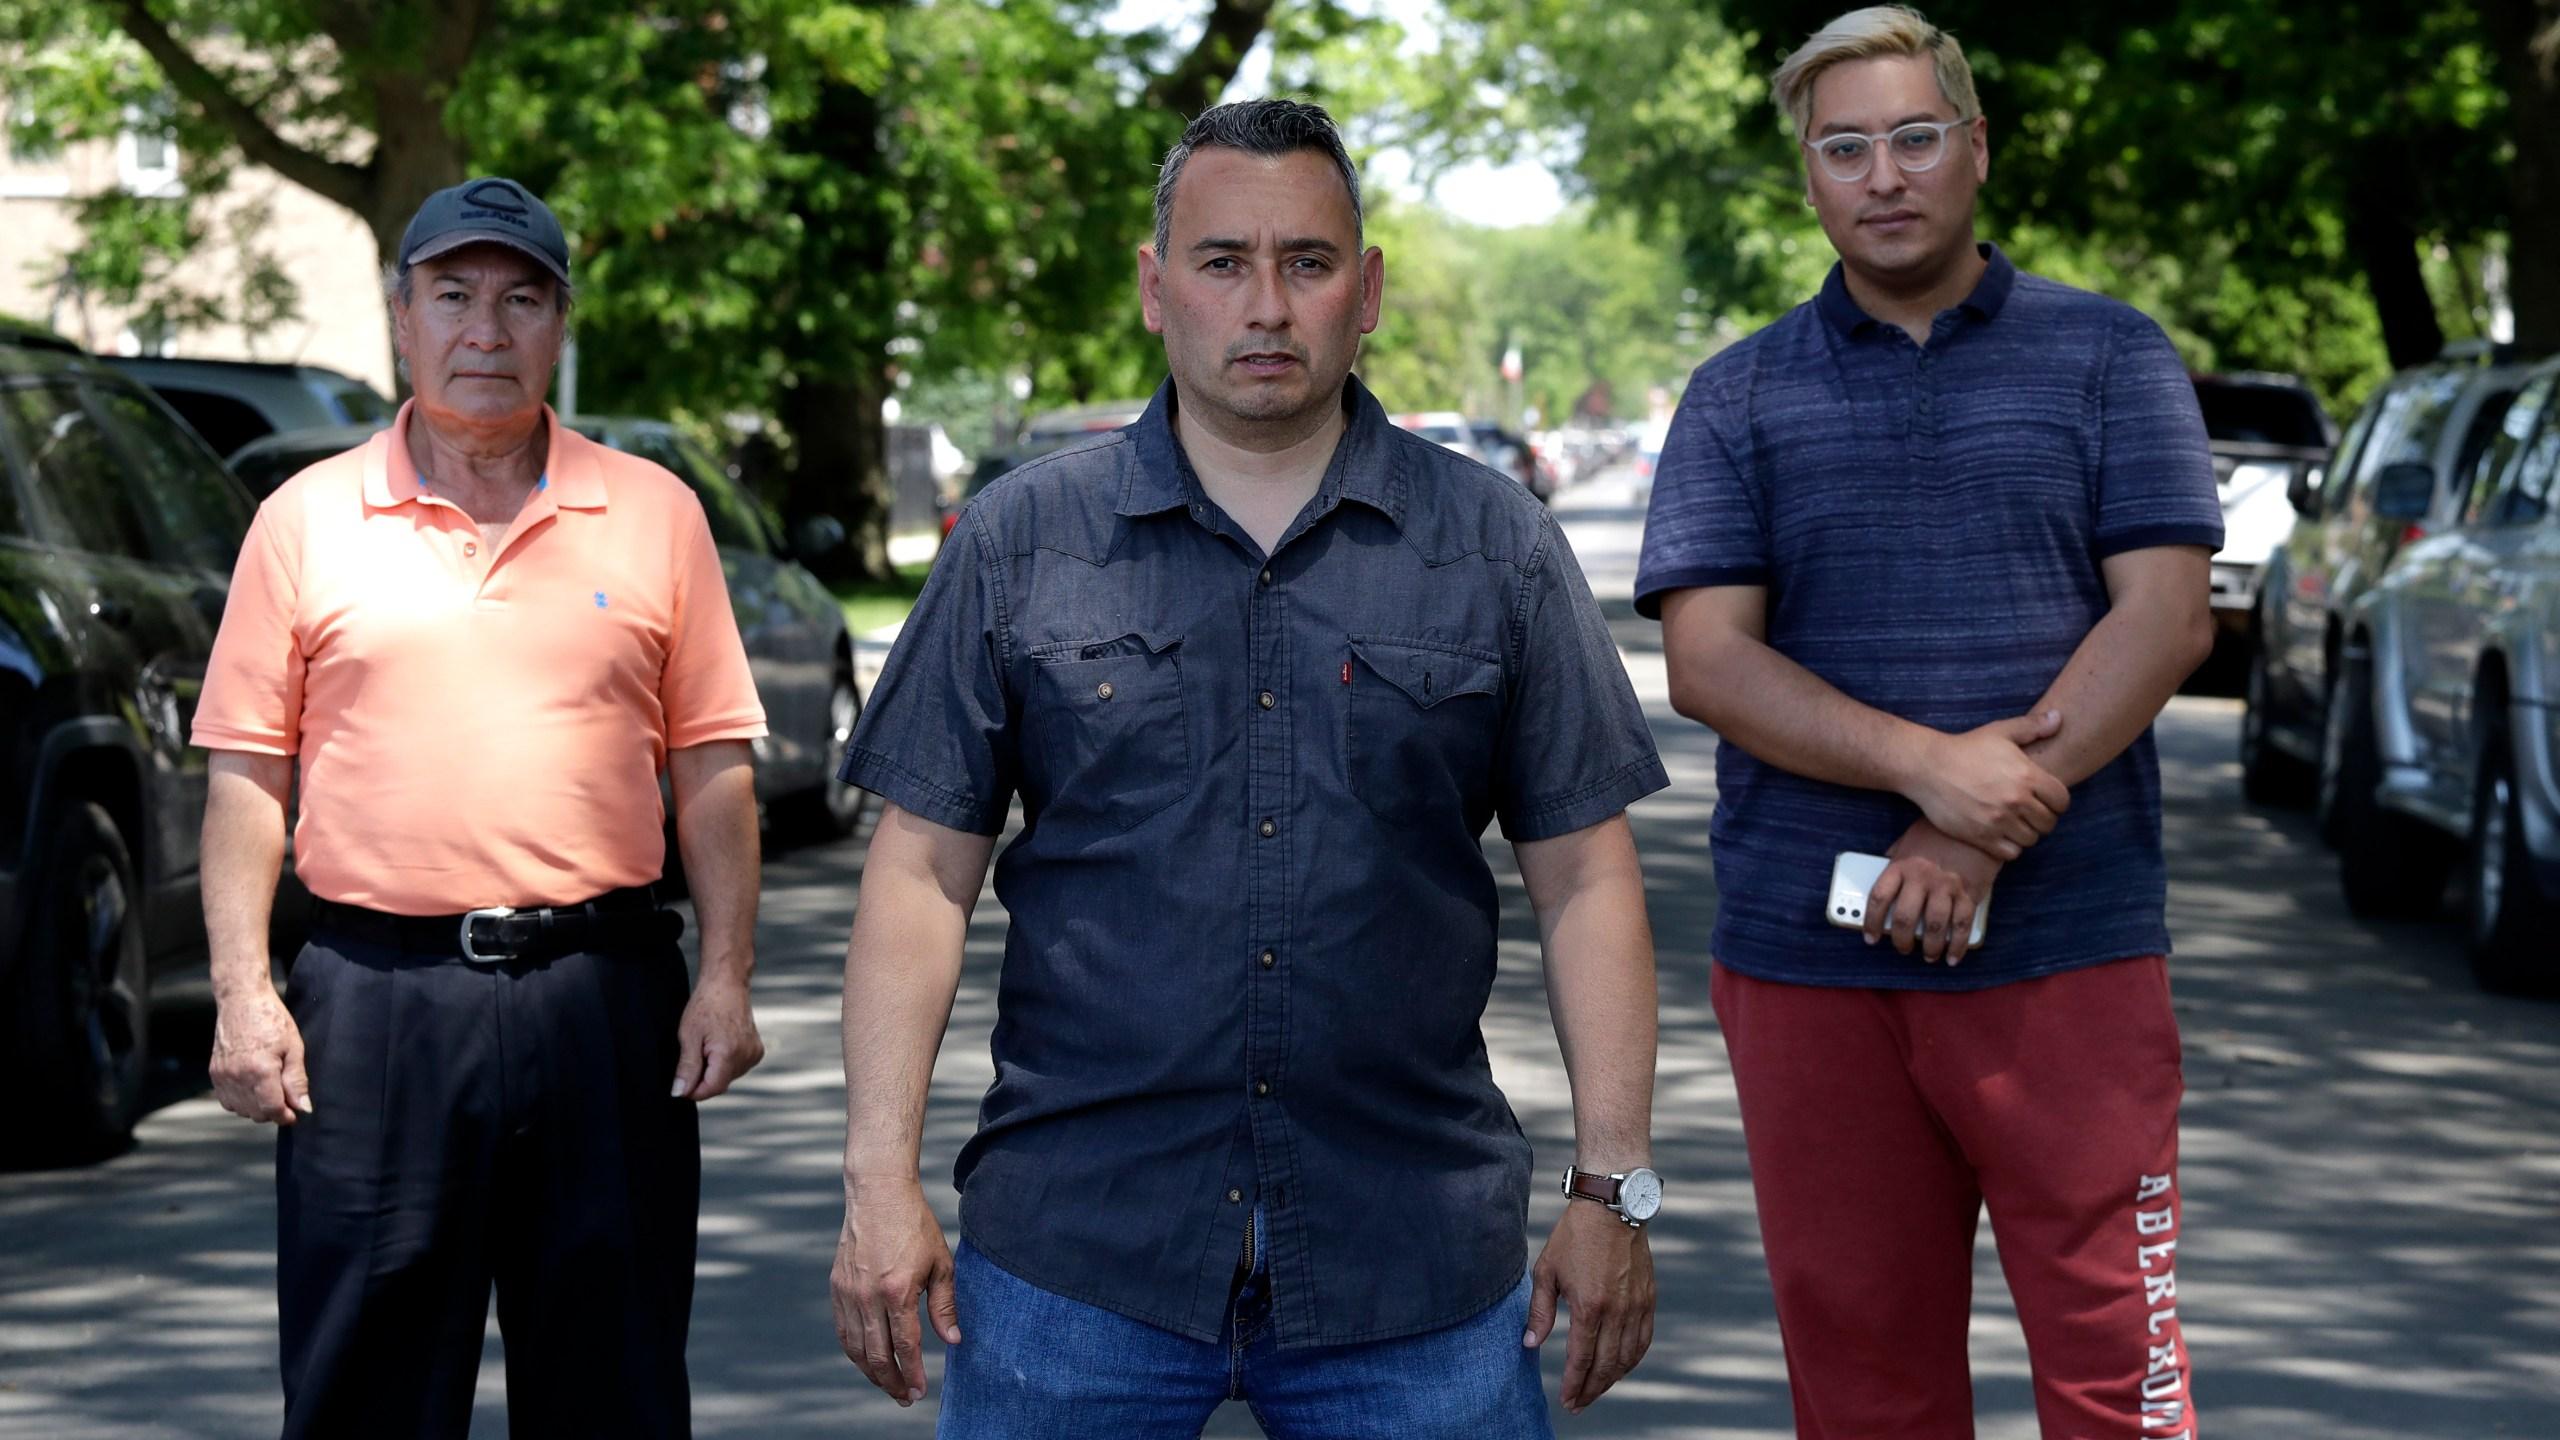 Juan Rodriguez, Raul Montes Jr, Radames Pina